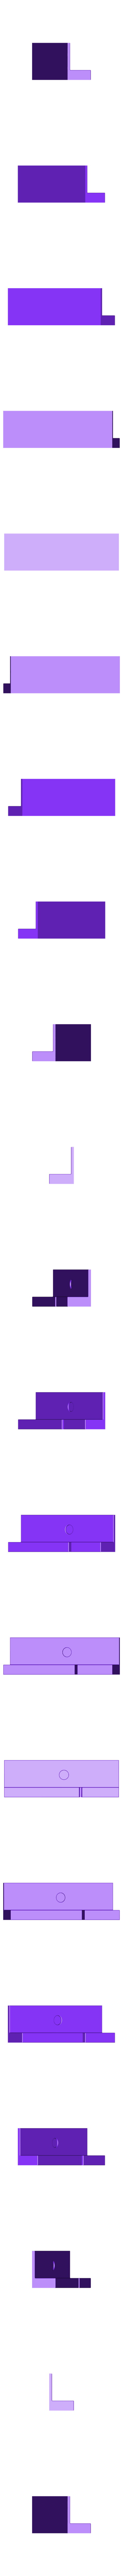 Werkzeughalter2.STL Download free STL file ZYYX 3D Printertools Holder • 3D printable object, Supeso